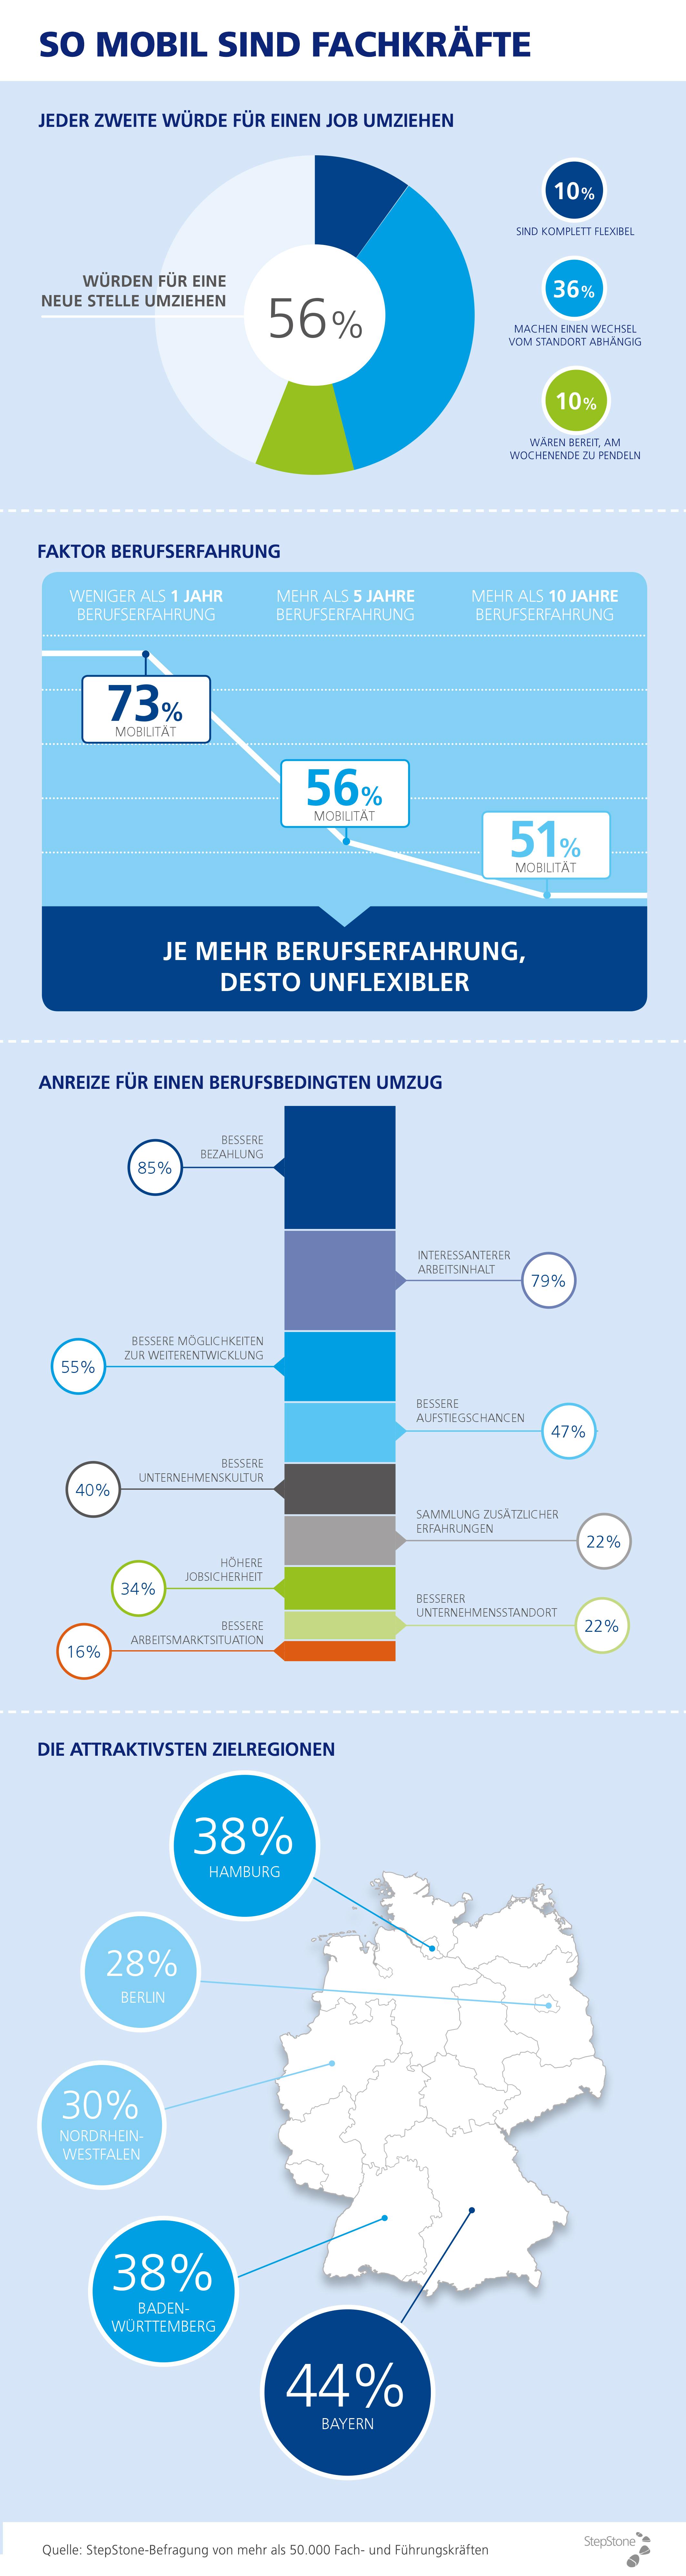 chart_stepstone_grafik_Fachkräfte_sind_mobil_2015_04_28